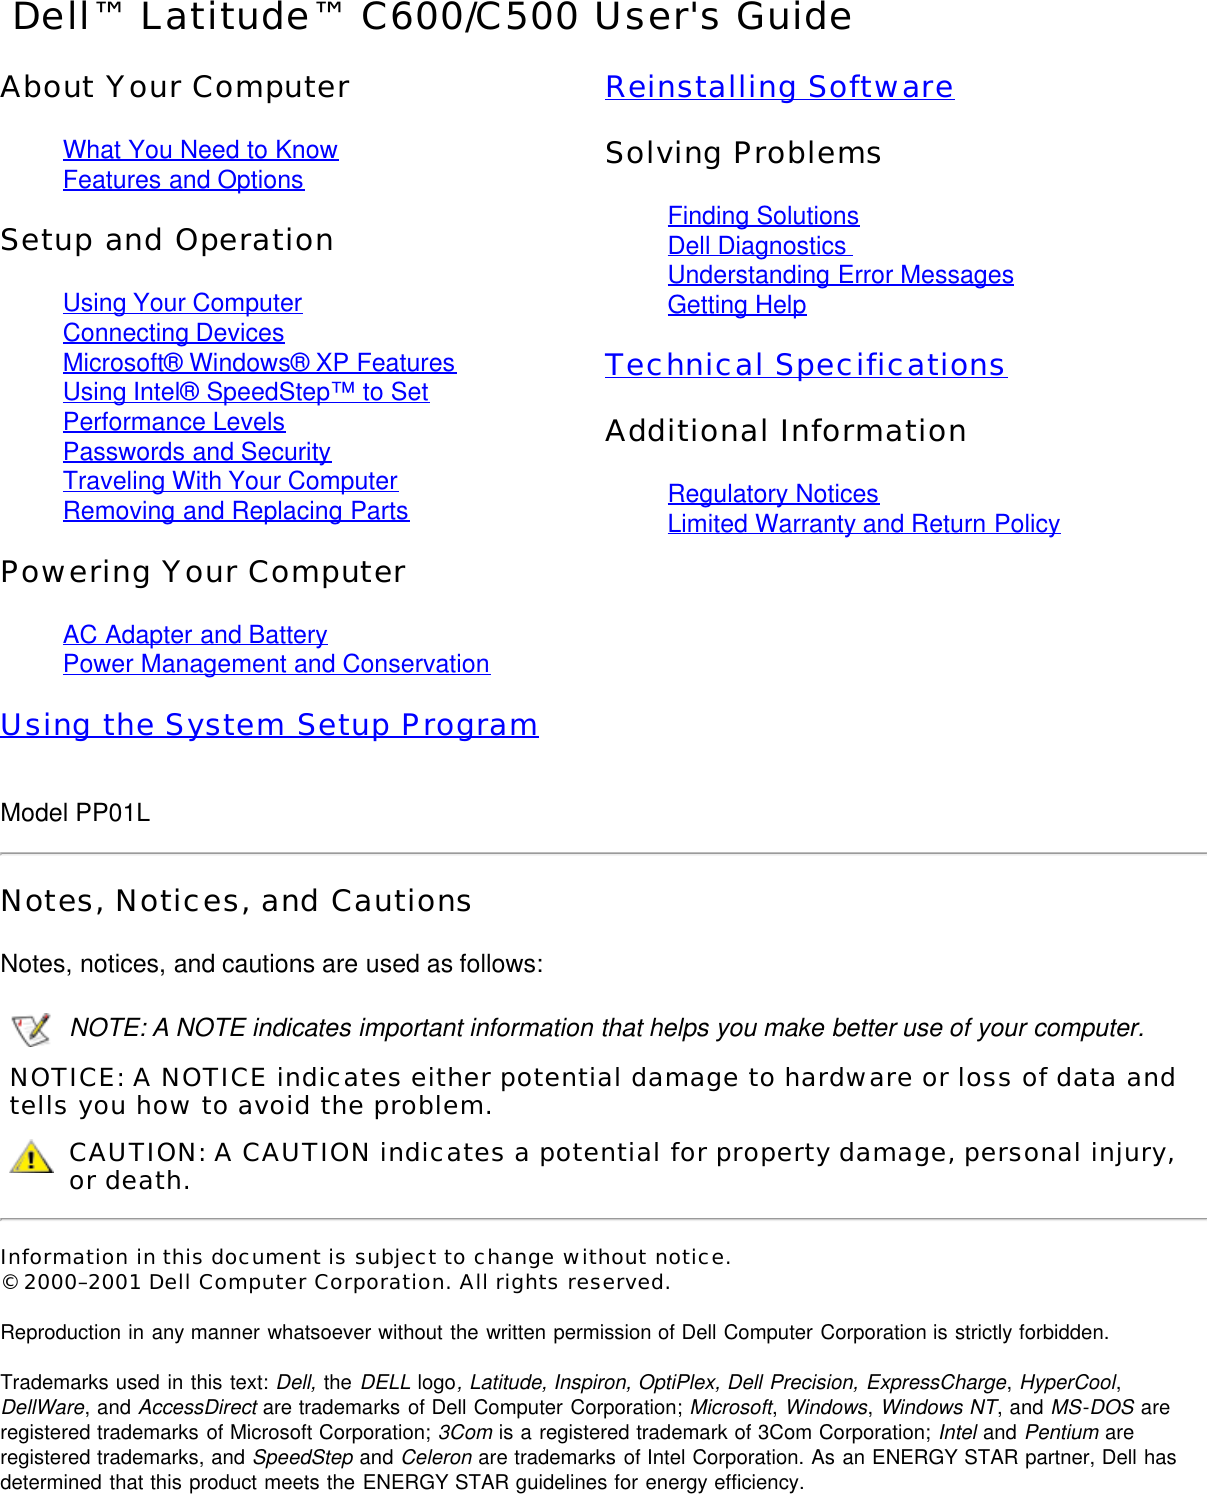 Dell Latitude Pp01l Drivers Windows Xp | My First JUGEM